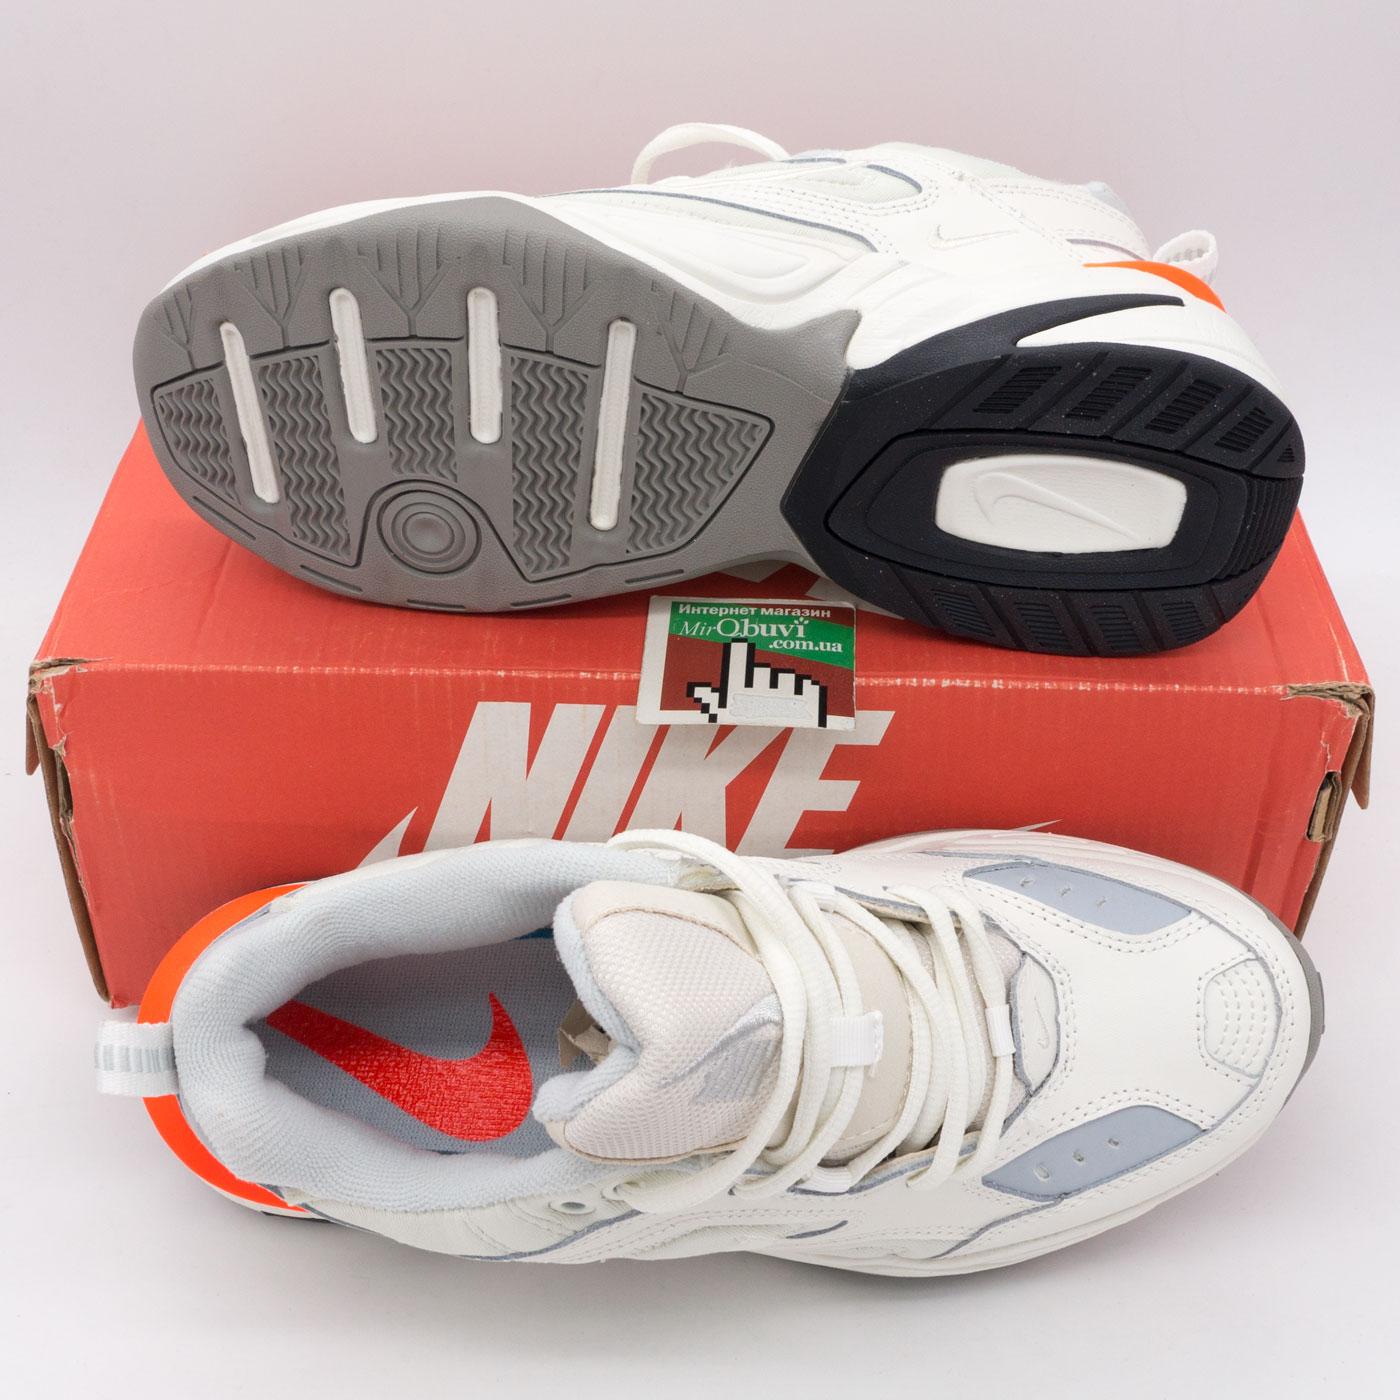 фото bottom Кроссовки Nike M2K Tekno белые с розовым. Топ качество! bottom